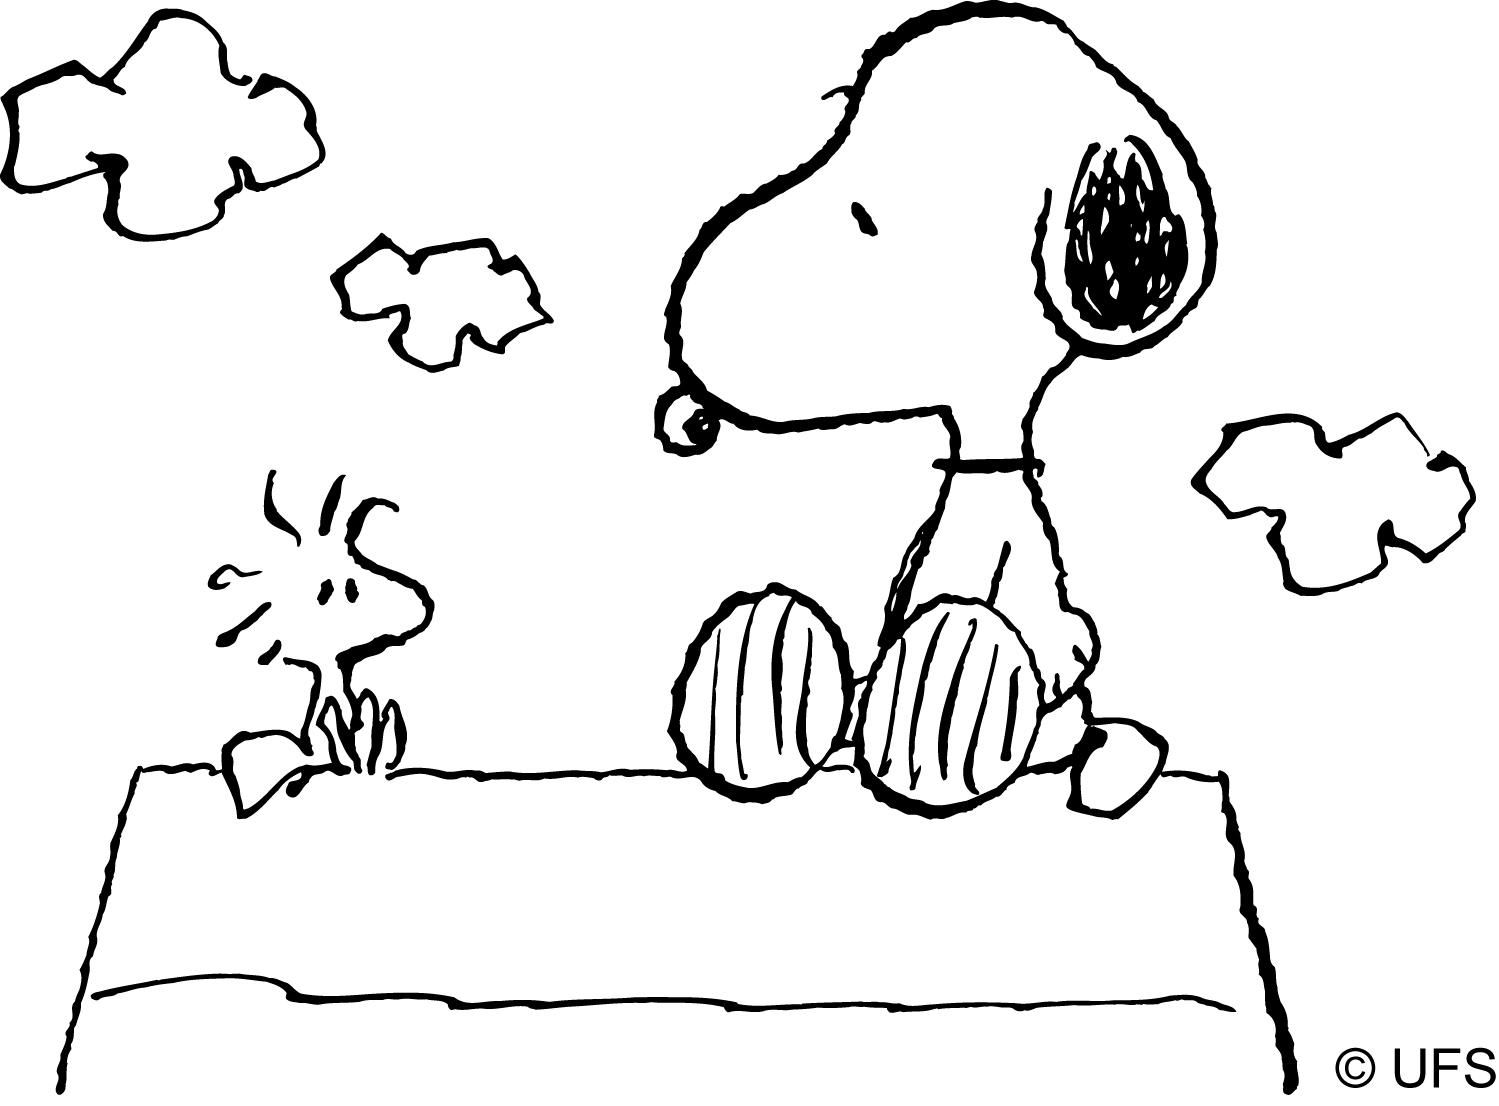 Peanuts Coloring Pages Ateli Coloriz Snoopy